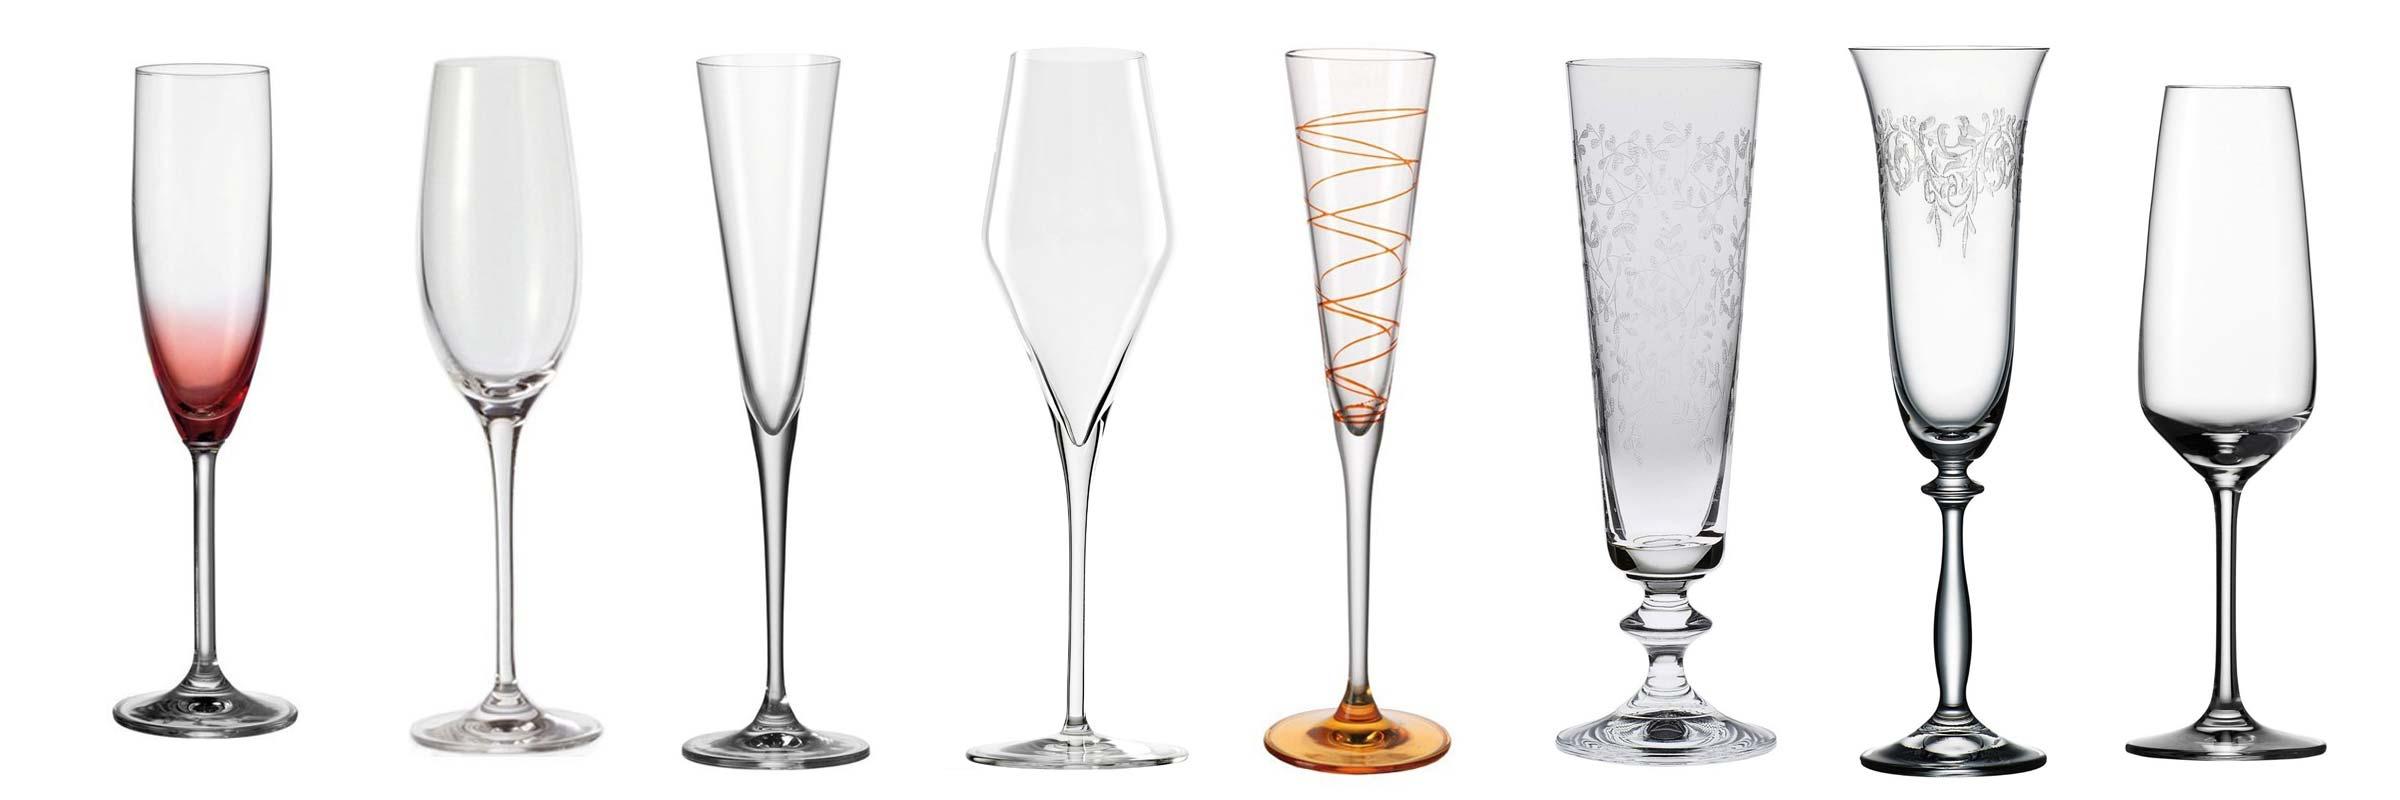 Ikea champagnergläser